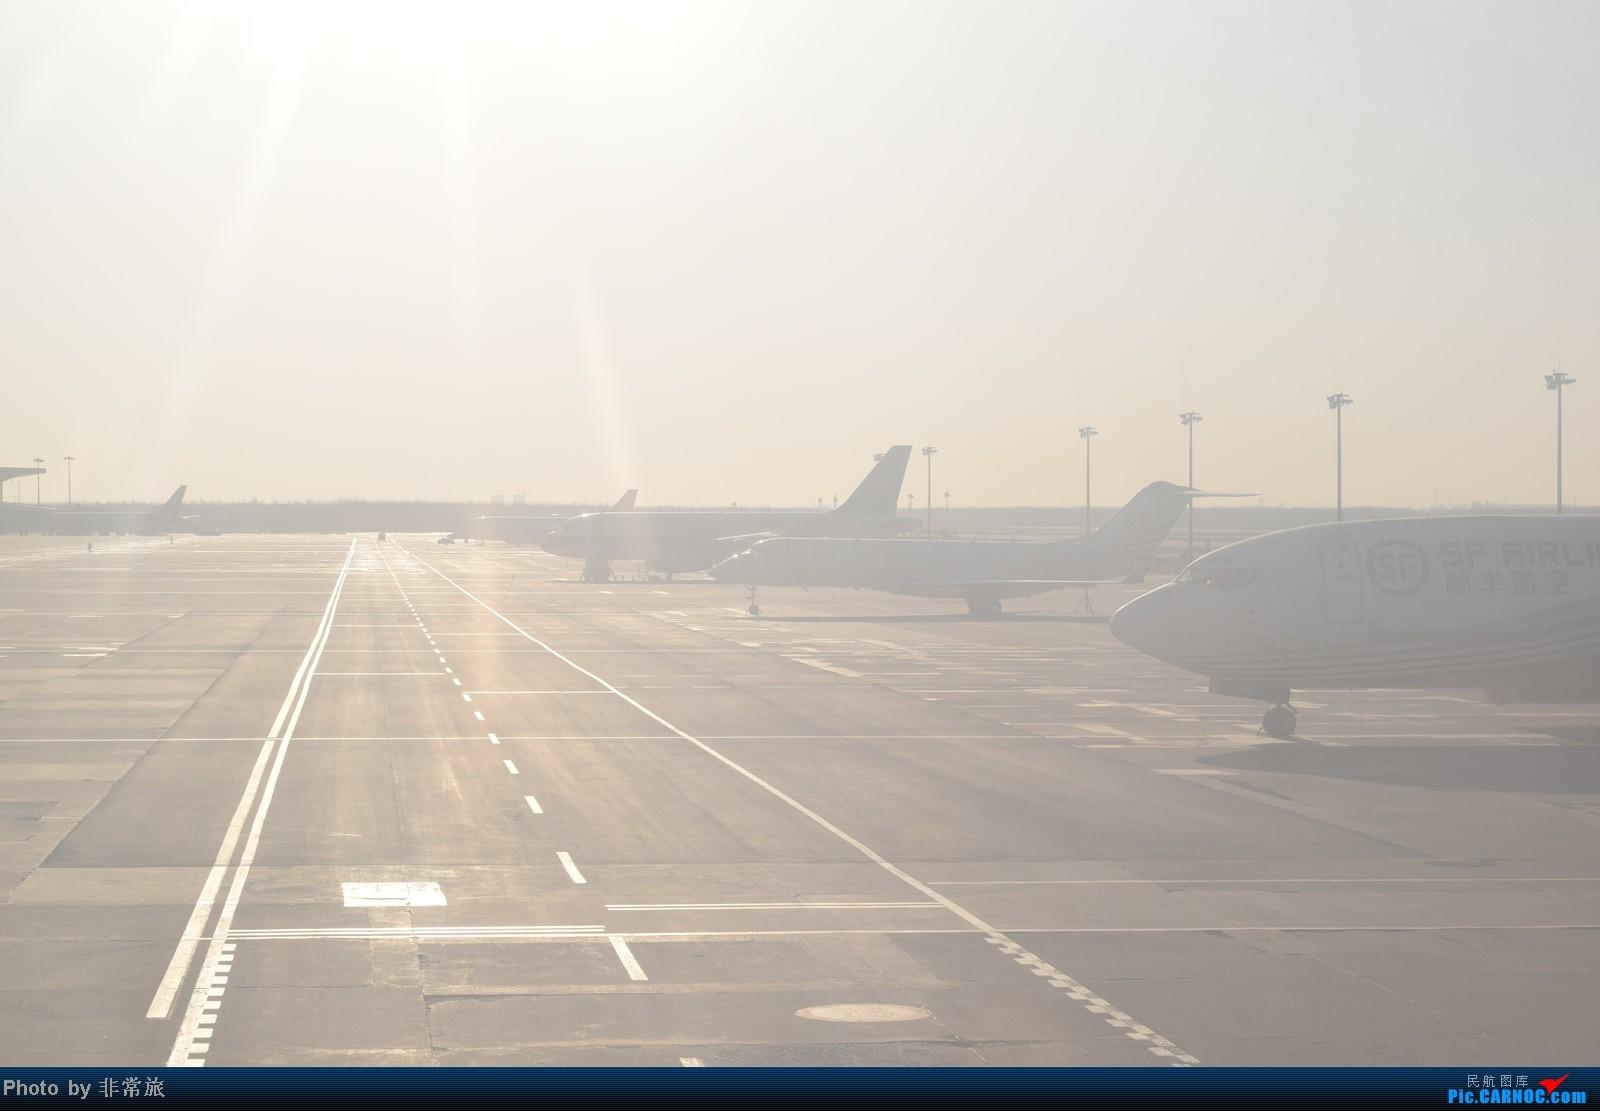 Re:[原创]大年三十除夕夜,三万英尺云霄间。 BOEING 737-300 B-2951 中国沈阳桃仙机场 中国沈阳桃仙机场